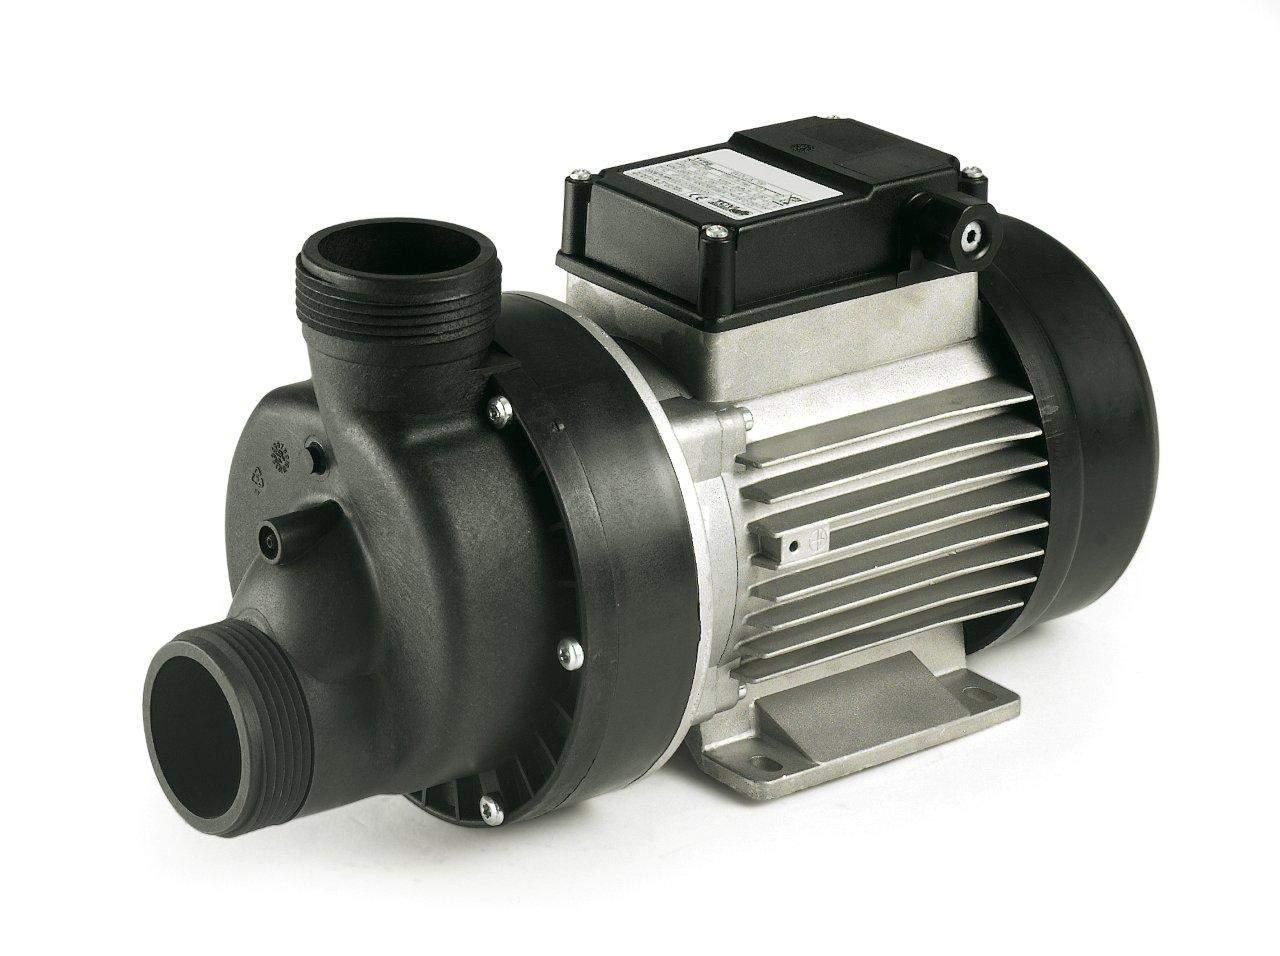 c75ee8cc3 Центробежный насос Evolux 1500, 25,5 м³/ч, 230 V, 0,90 кВт, соед 50 ...